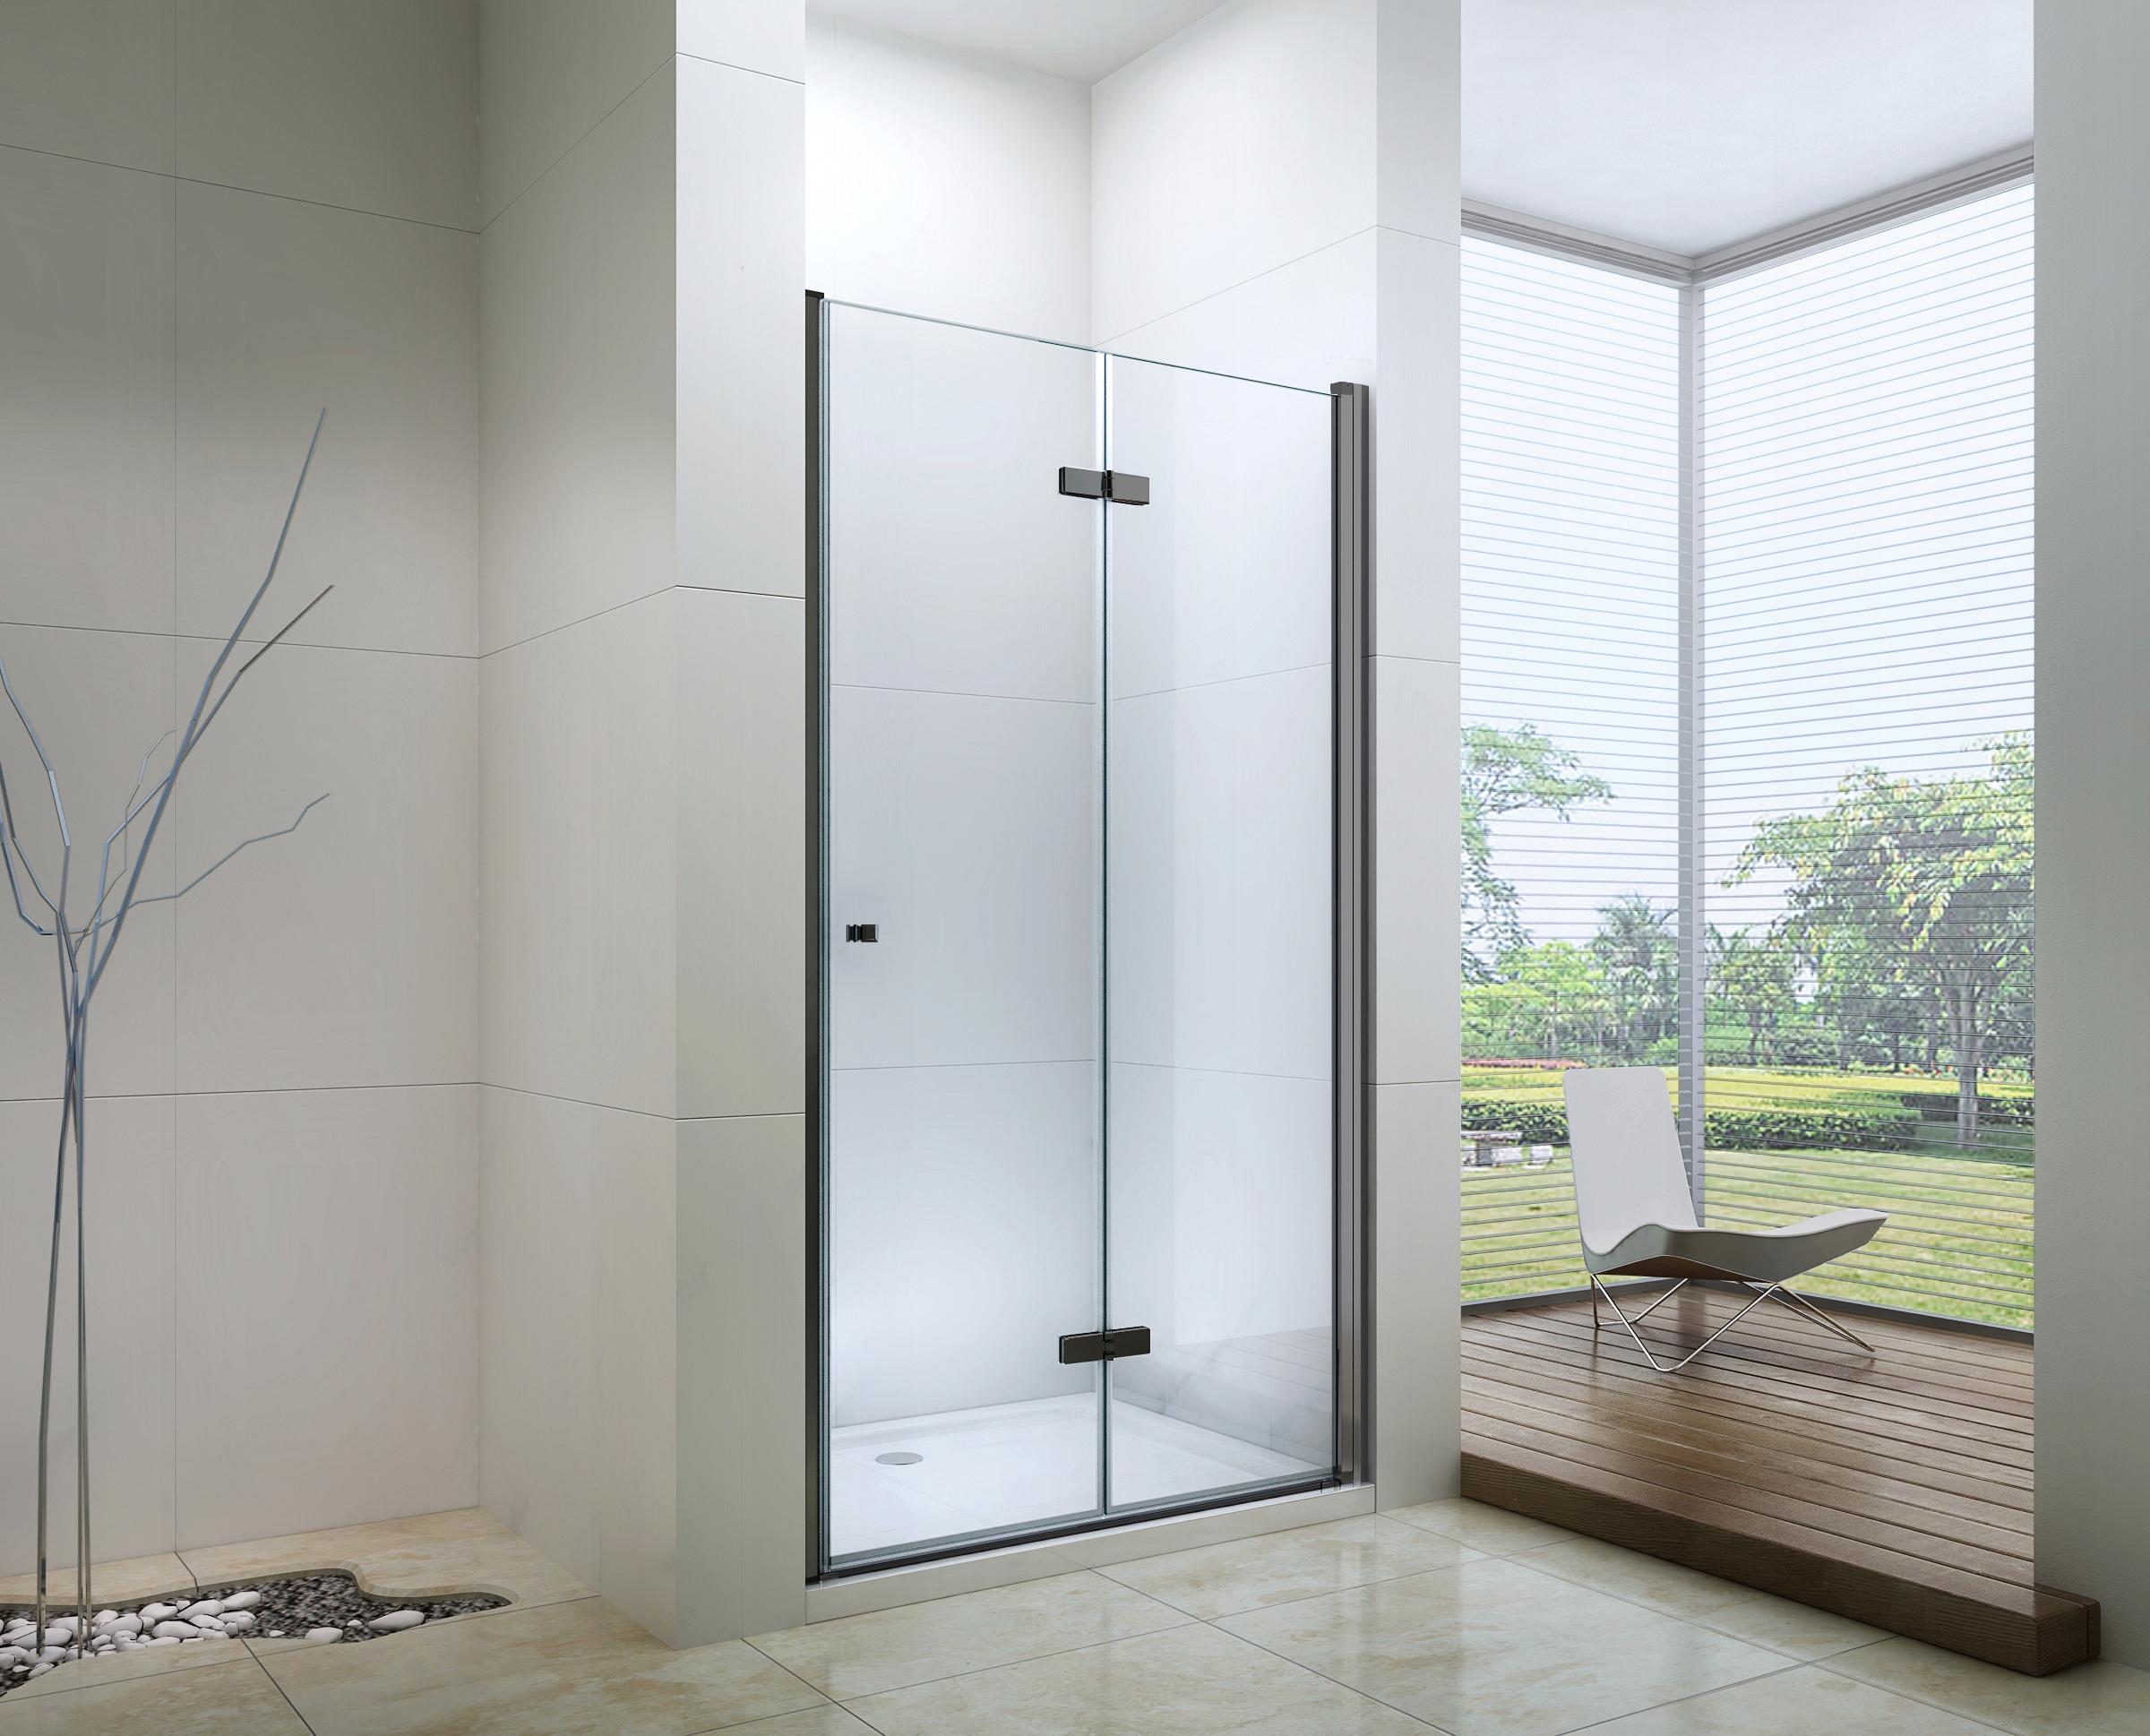 24 shower door alto car mat